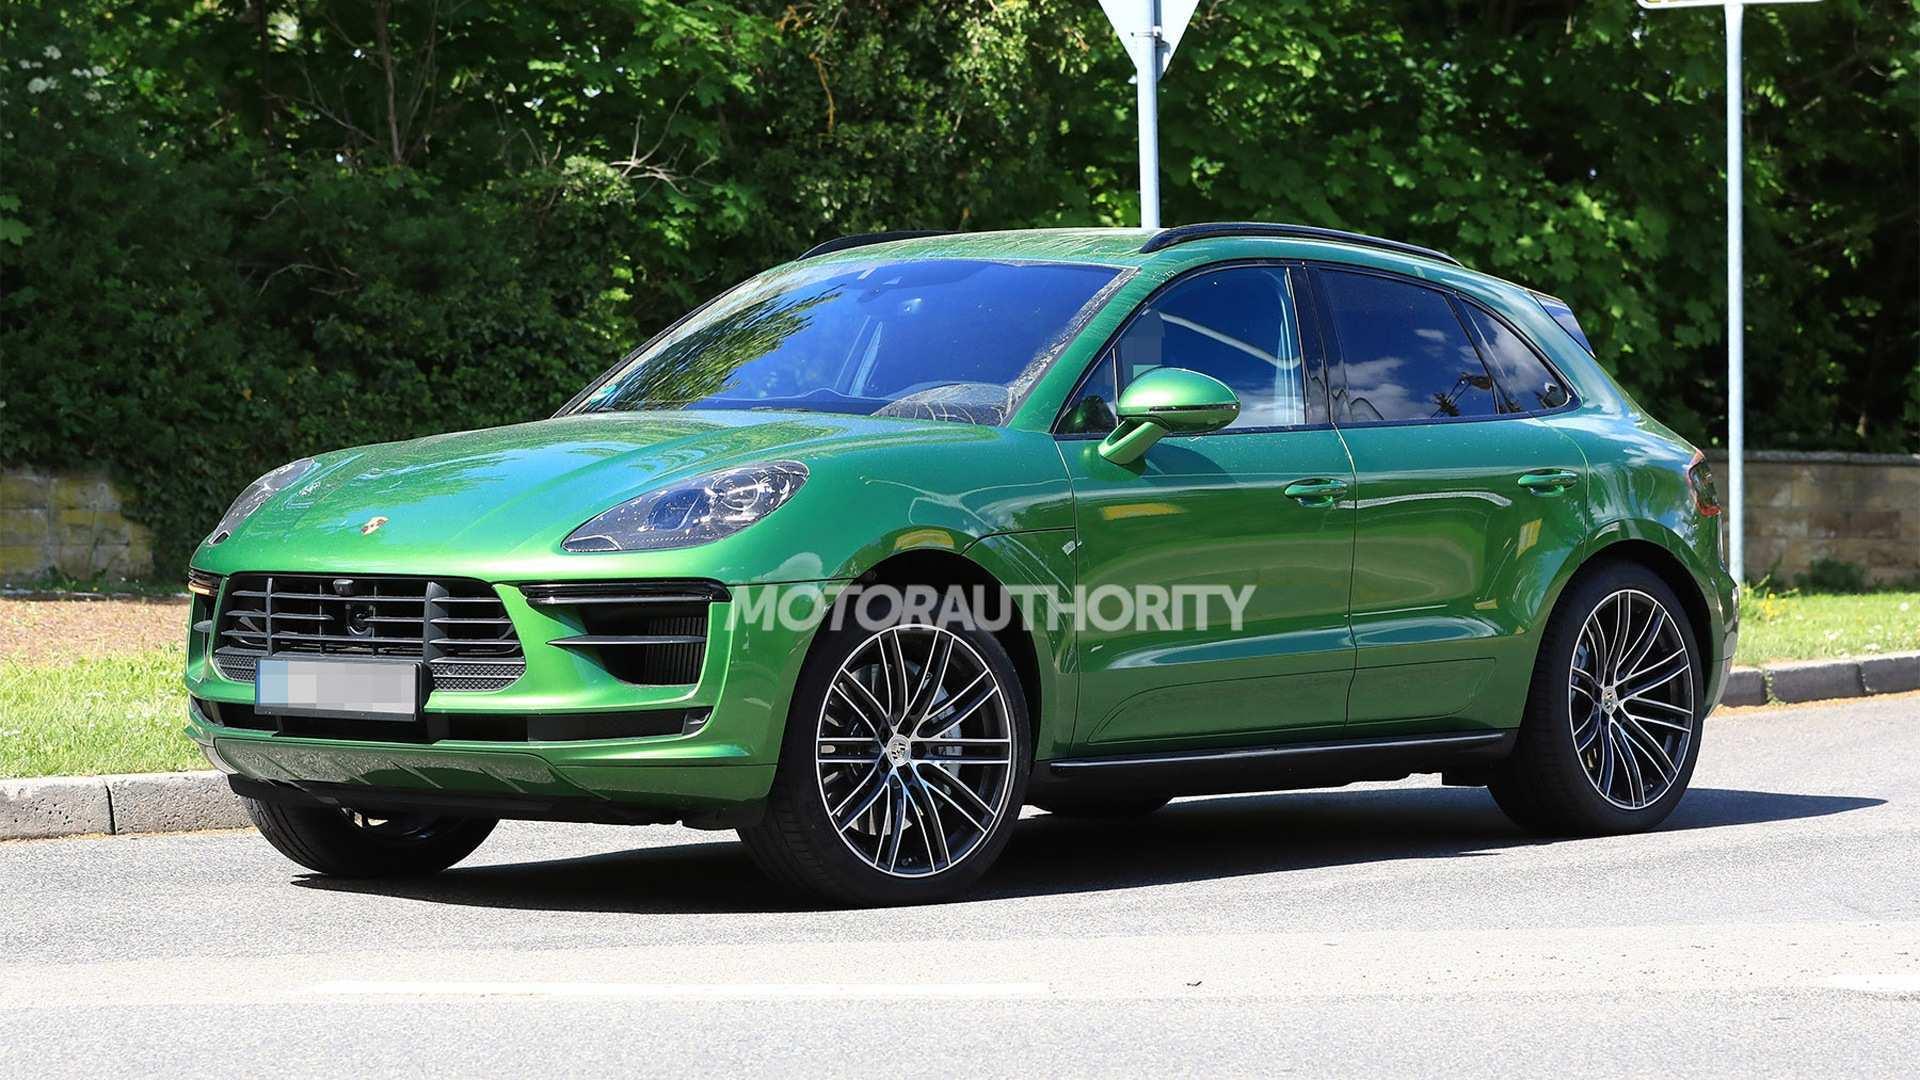 84 Gallery of 2019 Porsche Macan Hybrid Reviews by 2019 Porsche Macan Hybrid